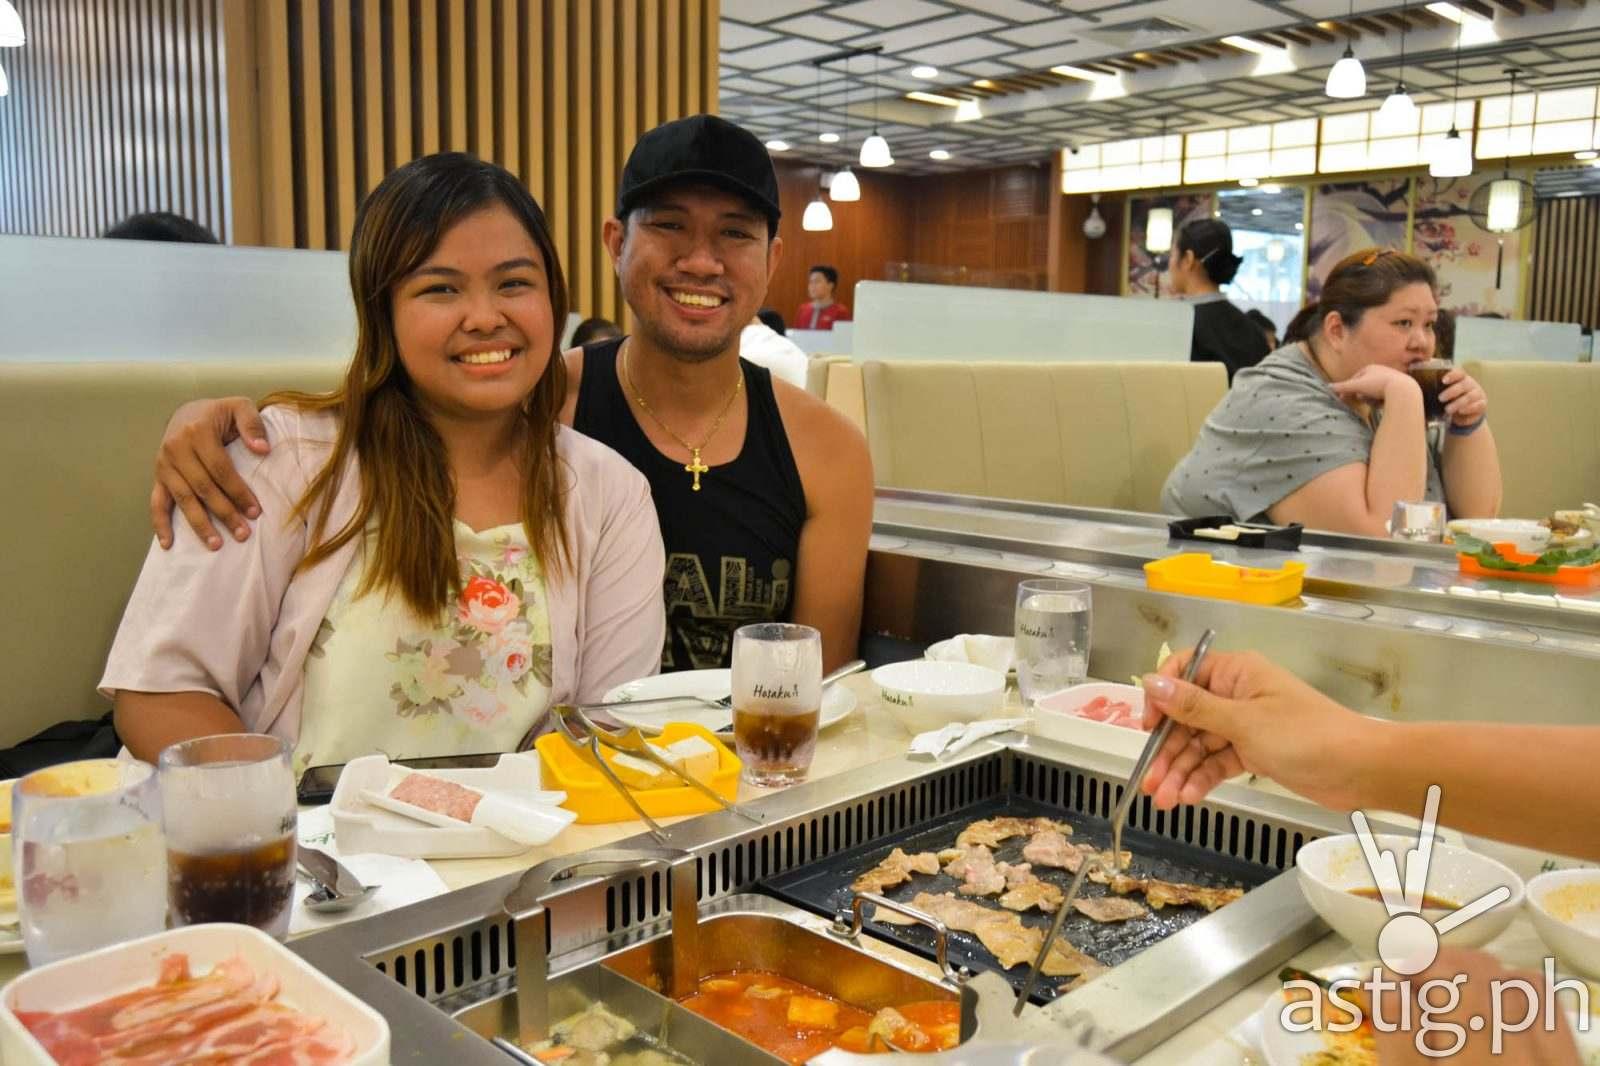 Kristiane Marfori and Jacque Colitoy of BuzzSetter - Hosaku International Buffet Philippines SM North Tower 2